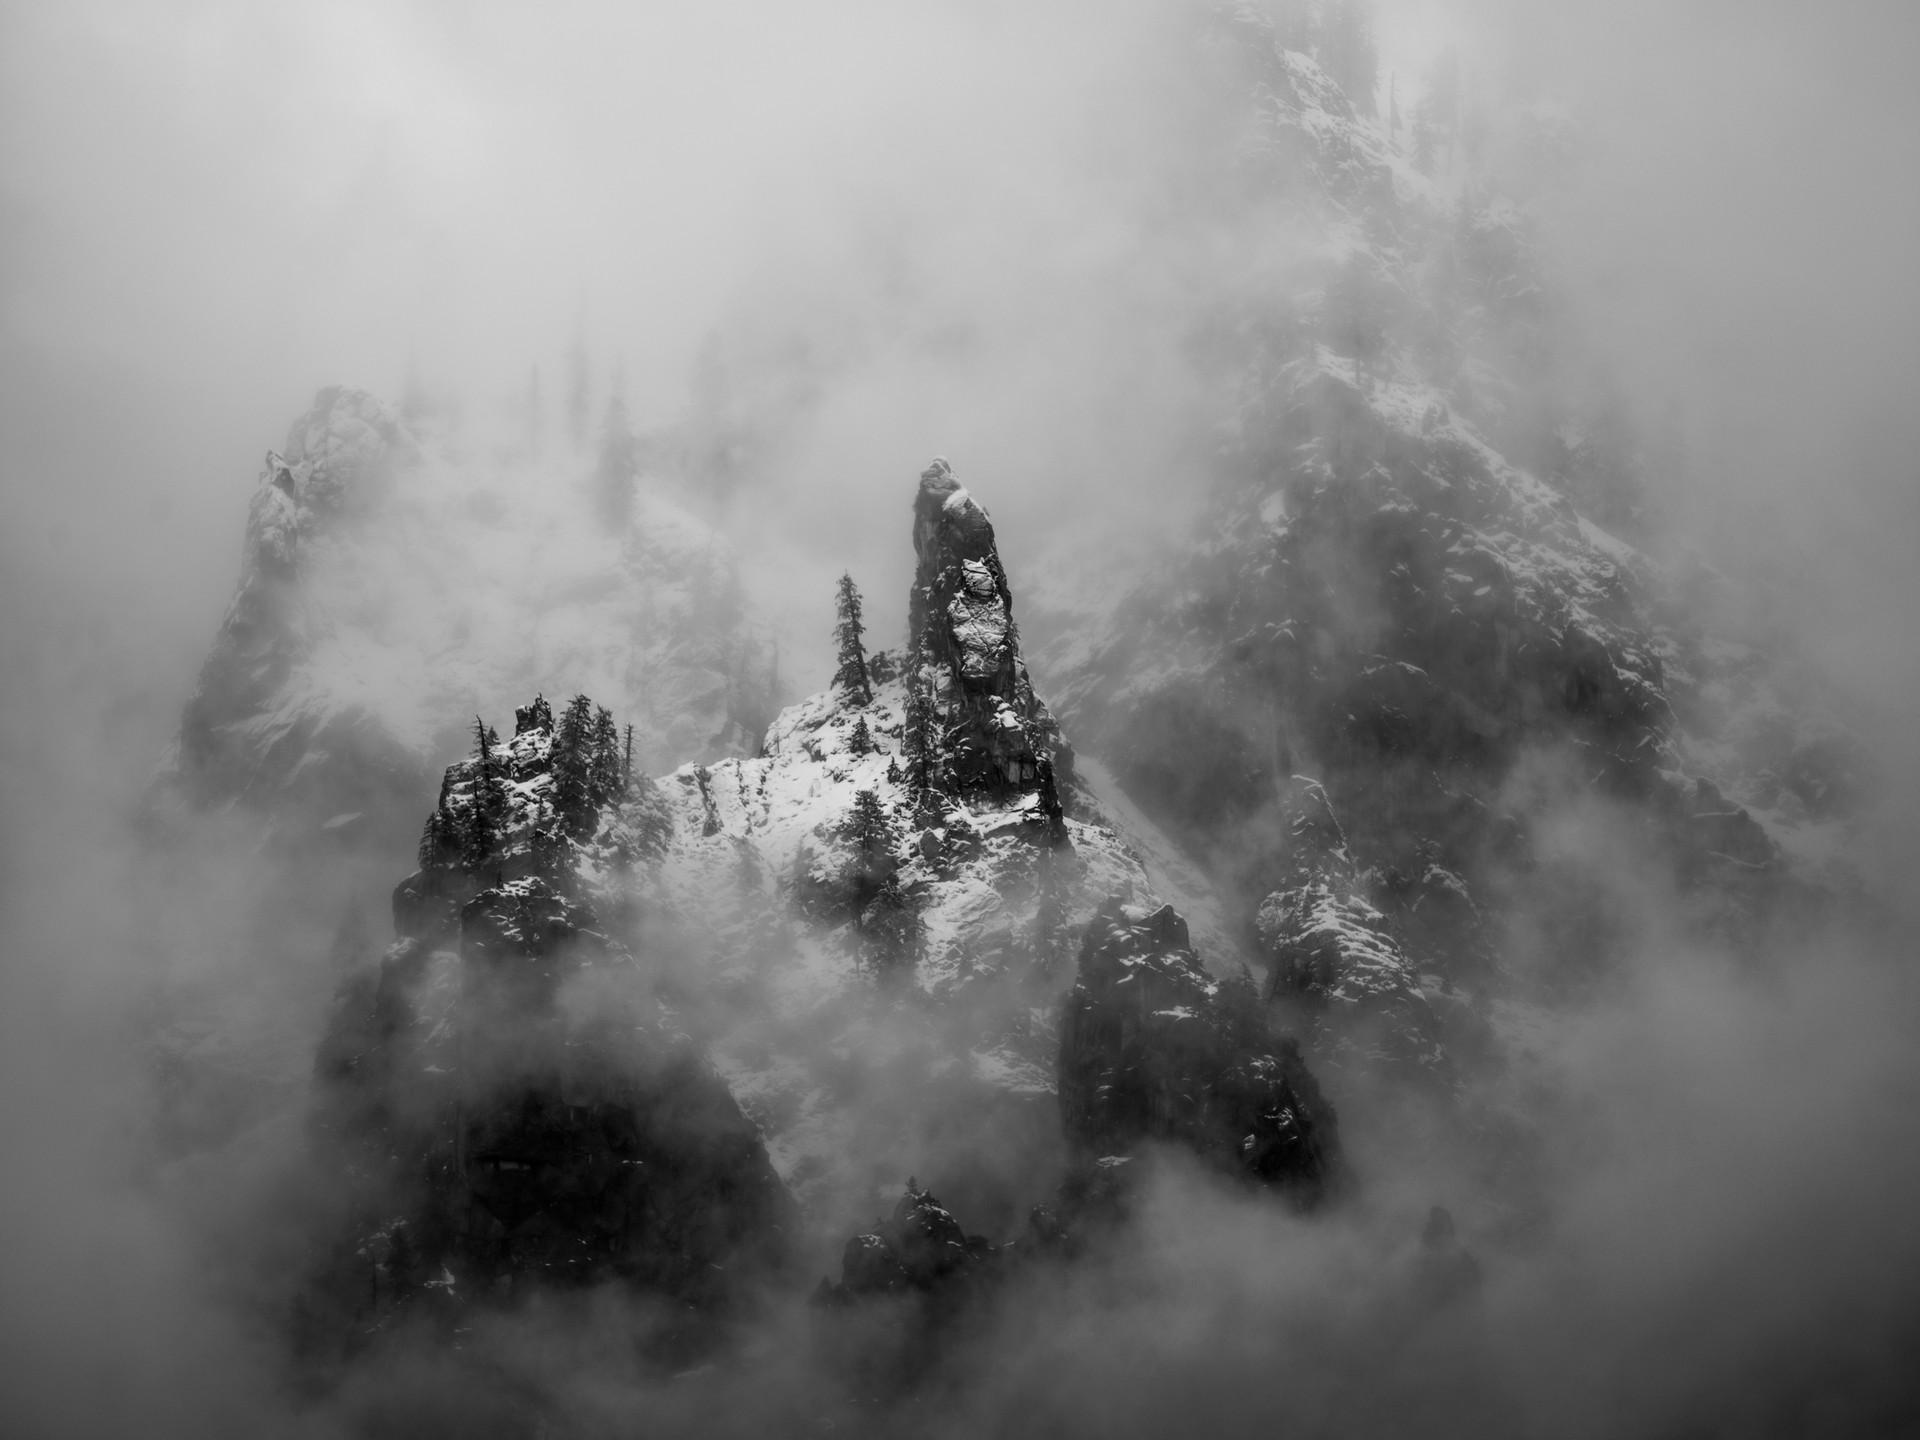 Yosemite national park 2018